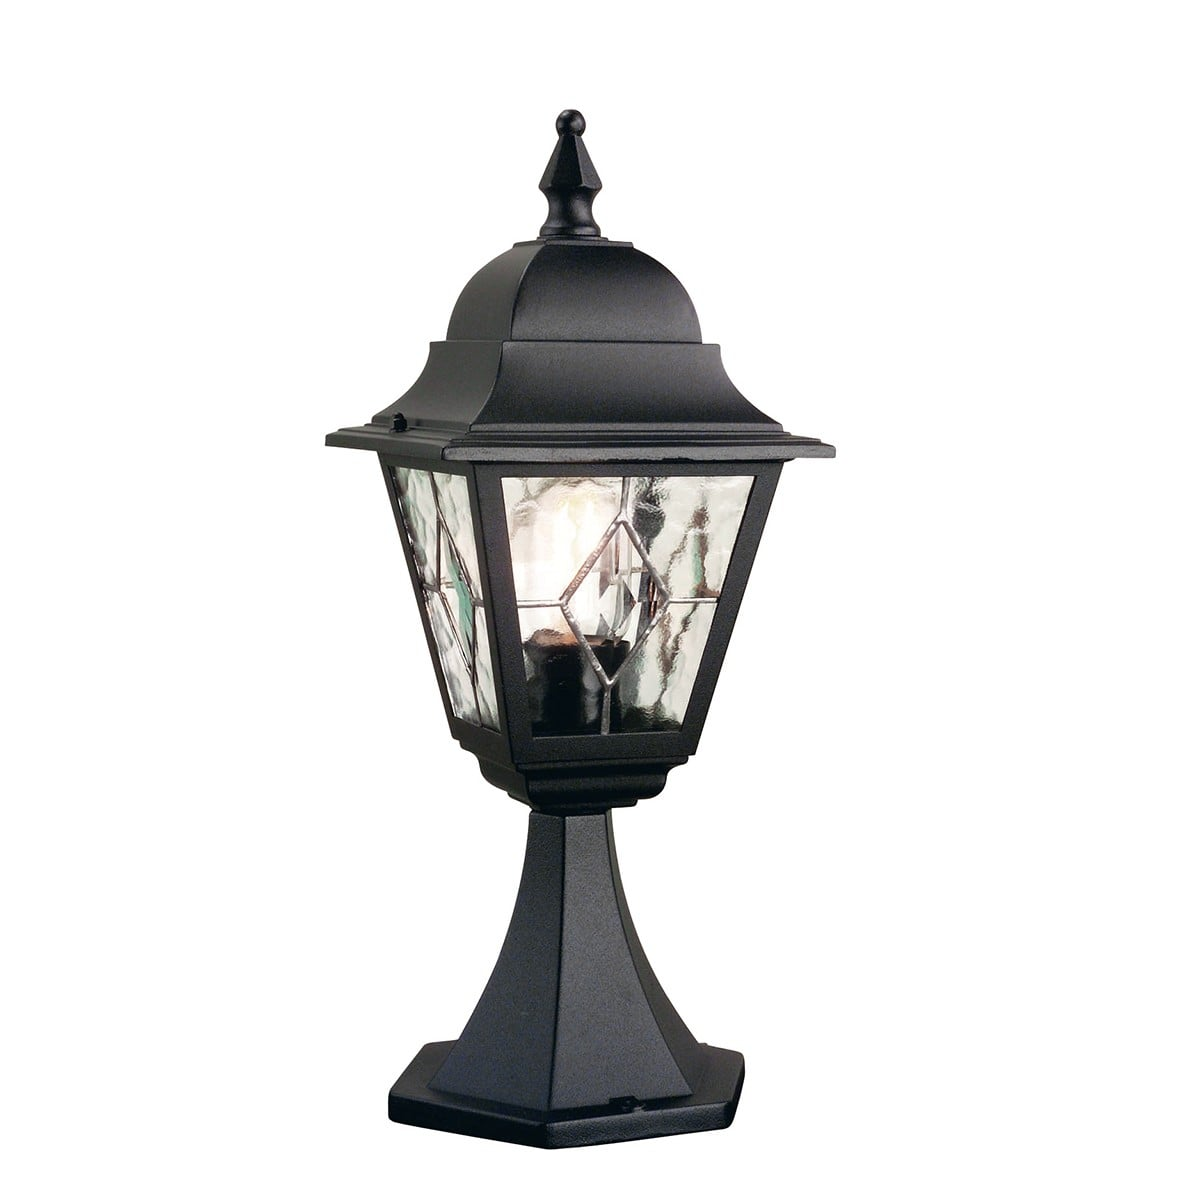 Elstead NR3BLK Norfolk Pedestal Lantern